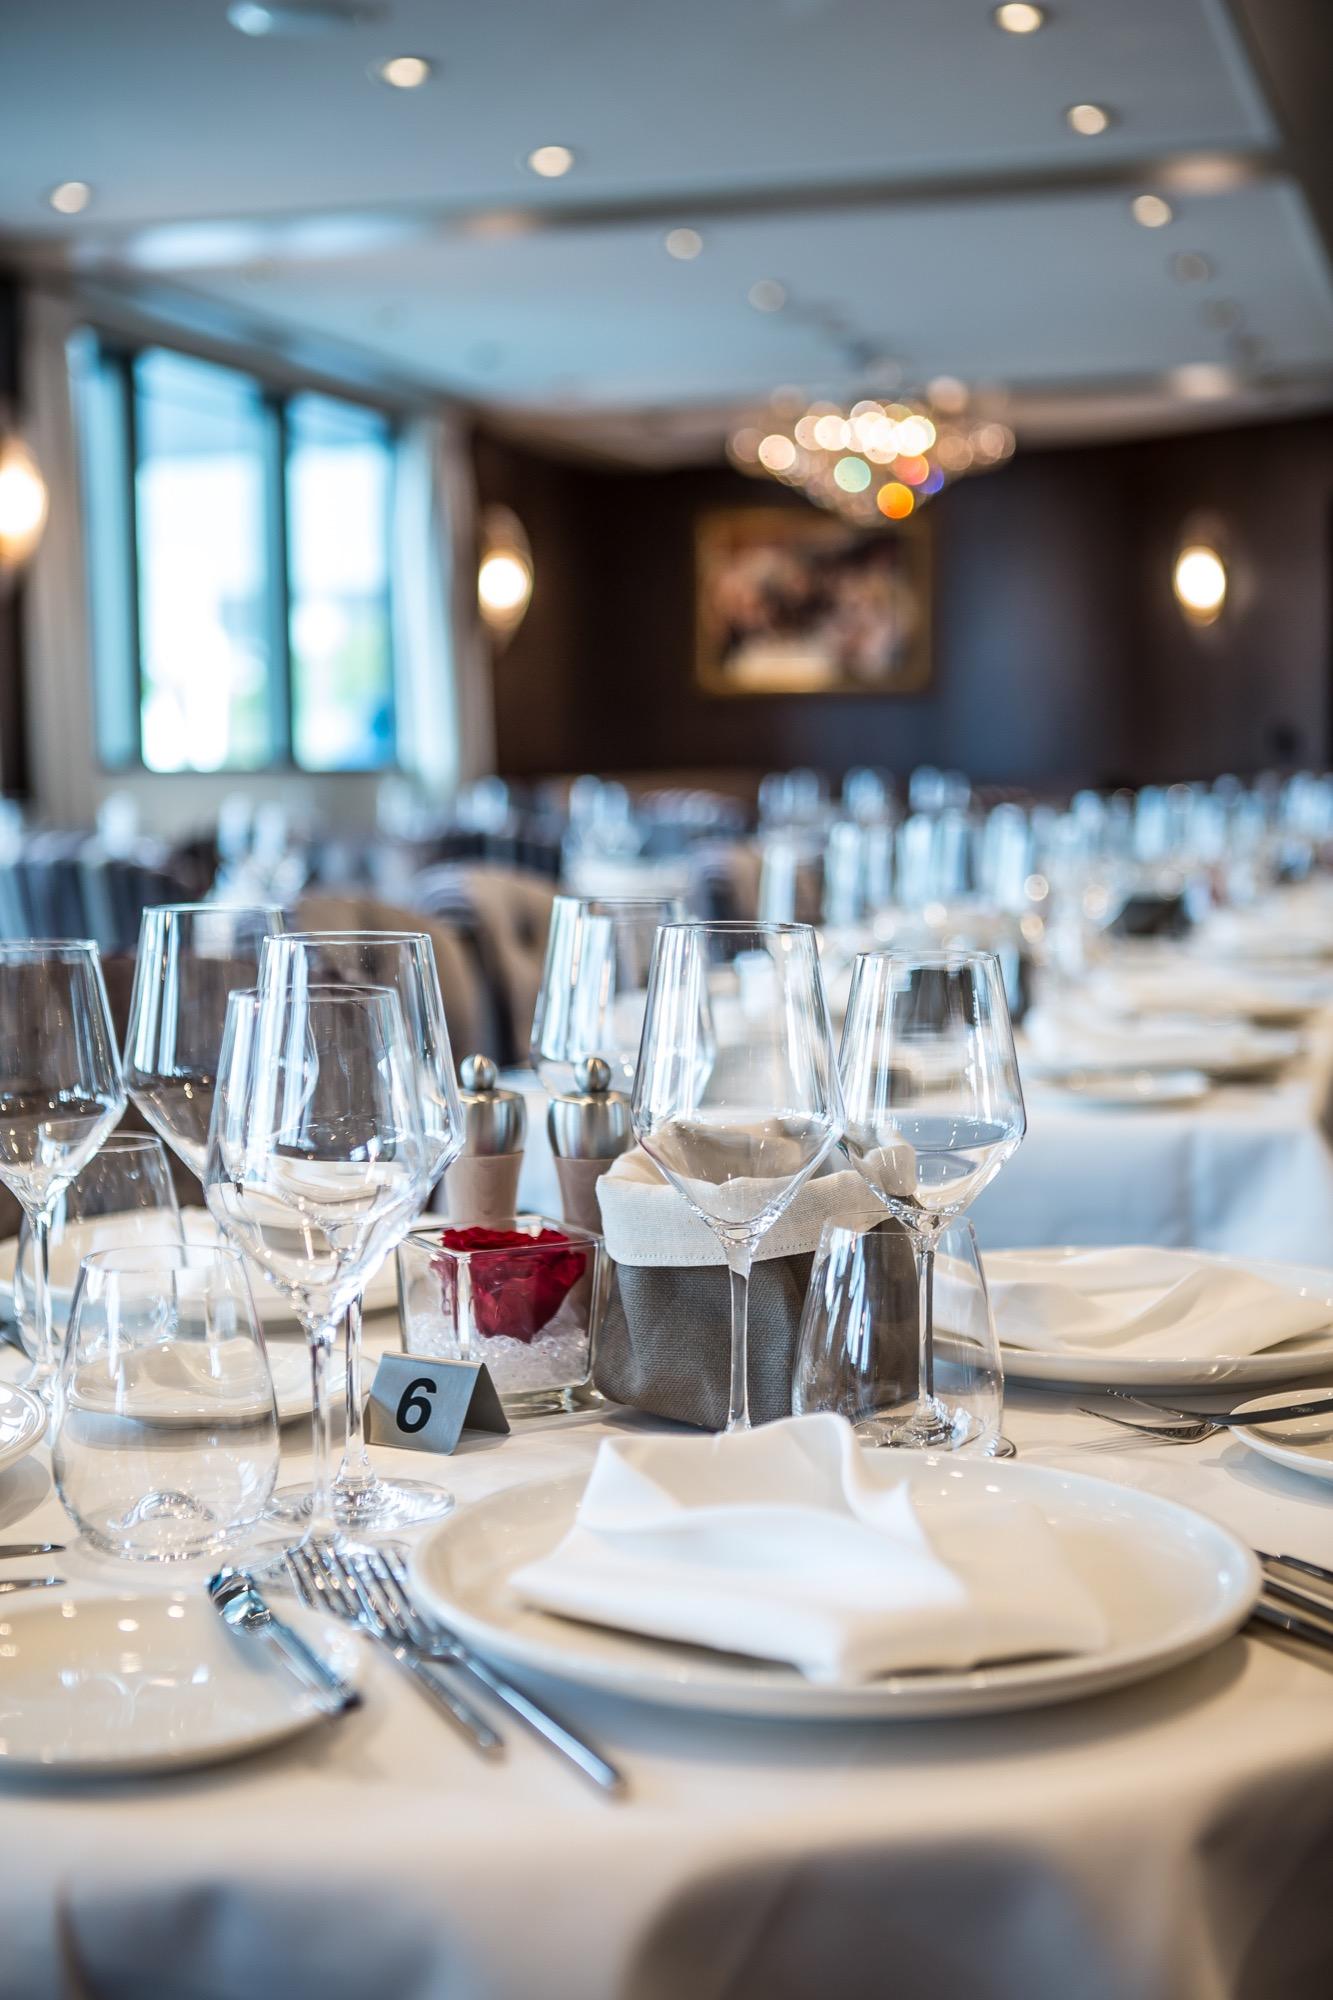 Riviera Travel Thomas Hardy Interior Restaurant 1.jpg